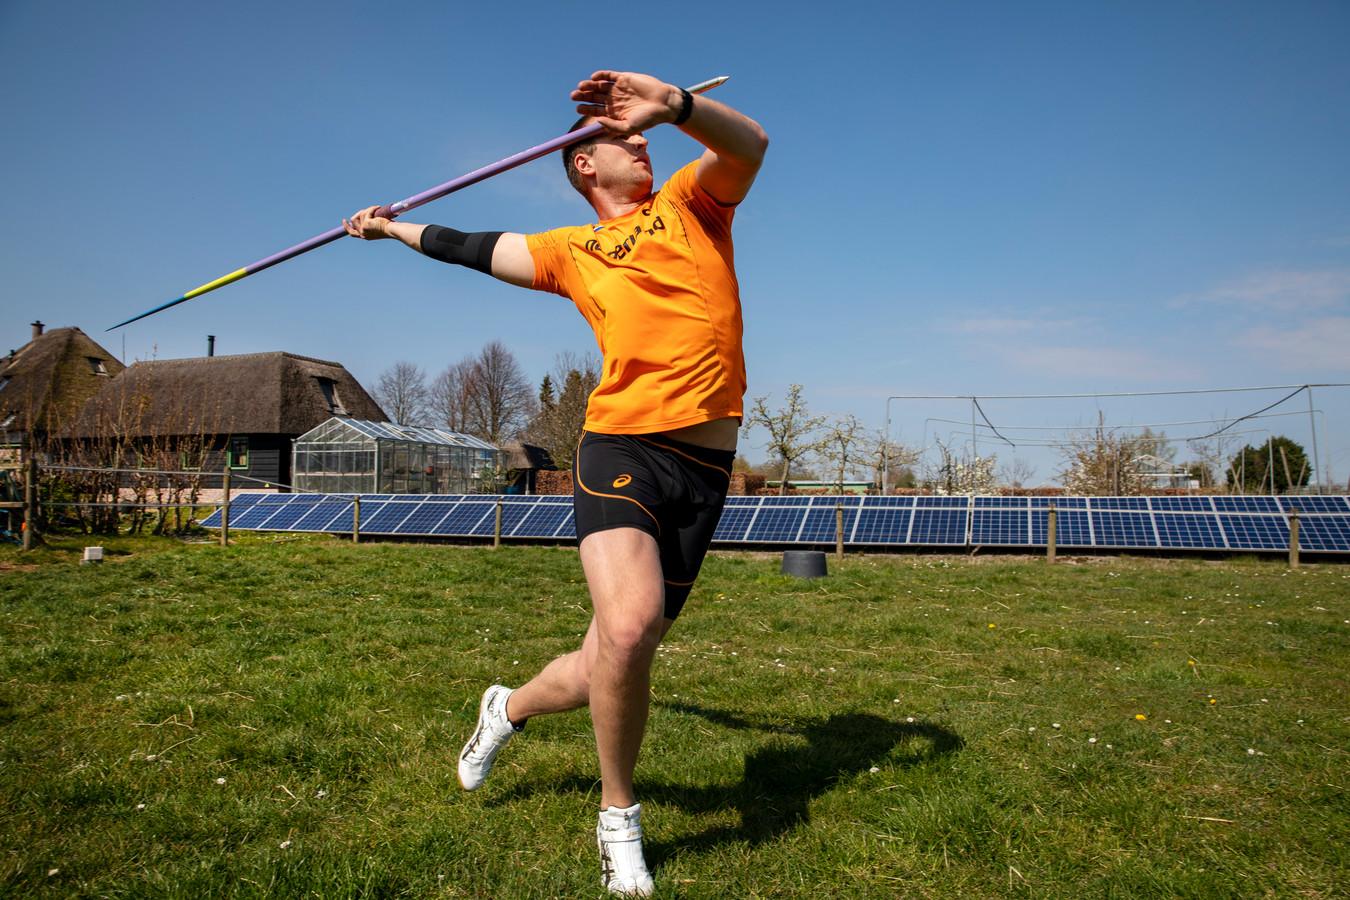 Thomas van Ophem oefent in een weiland